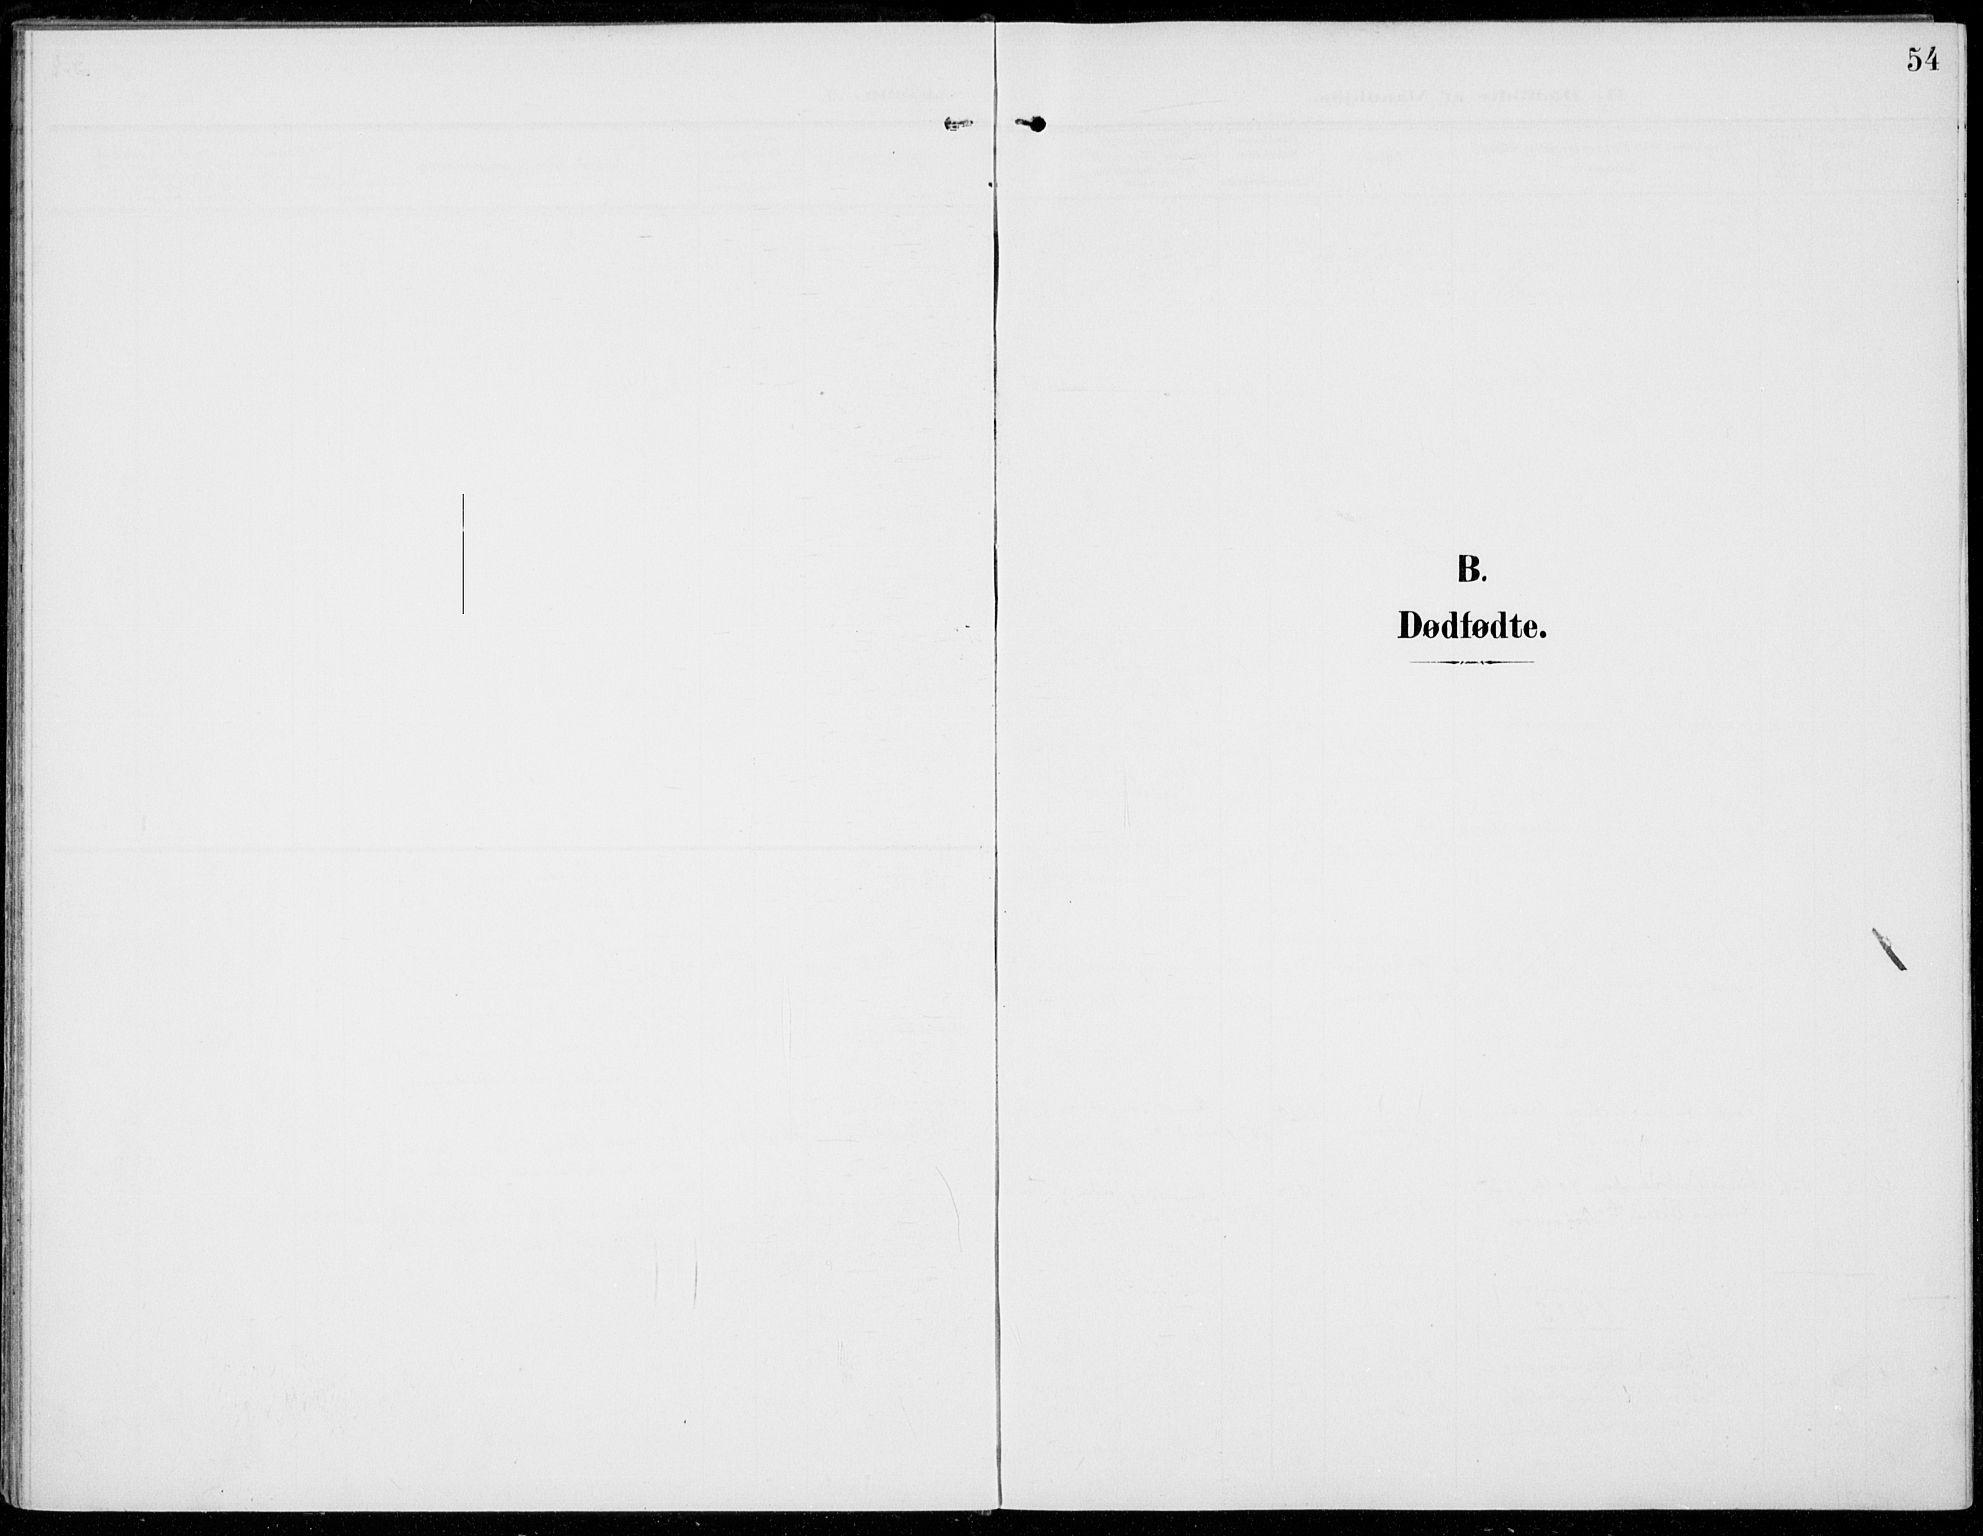 SAH, Sel prestekontor, Ministerialbok nr. 1, 1905-1922, s. 54